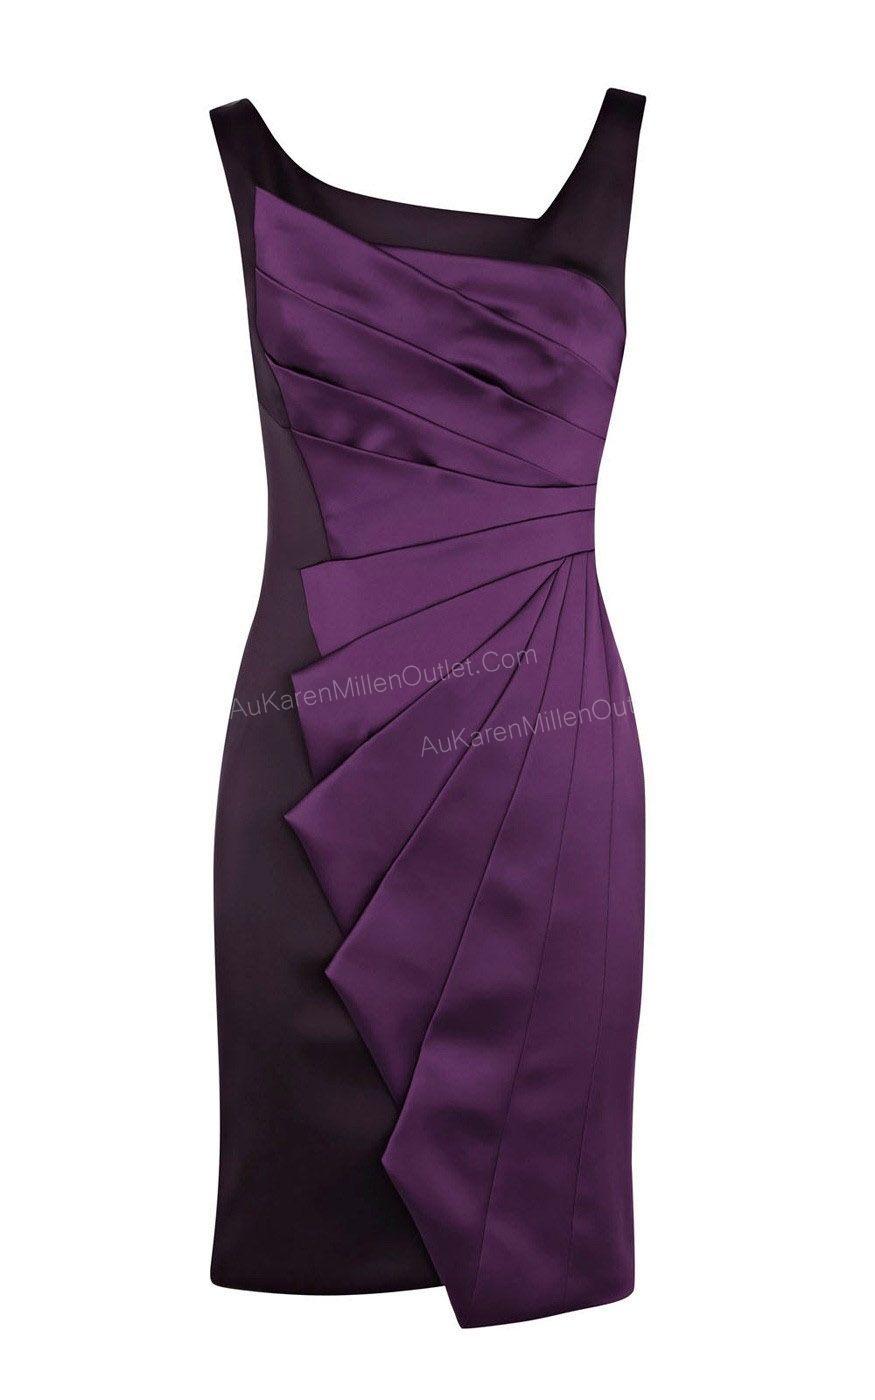 Karen Millen | Todo Vestdos | Pinterest | Vestiditos, Vestidos ...